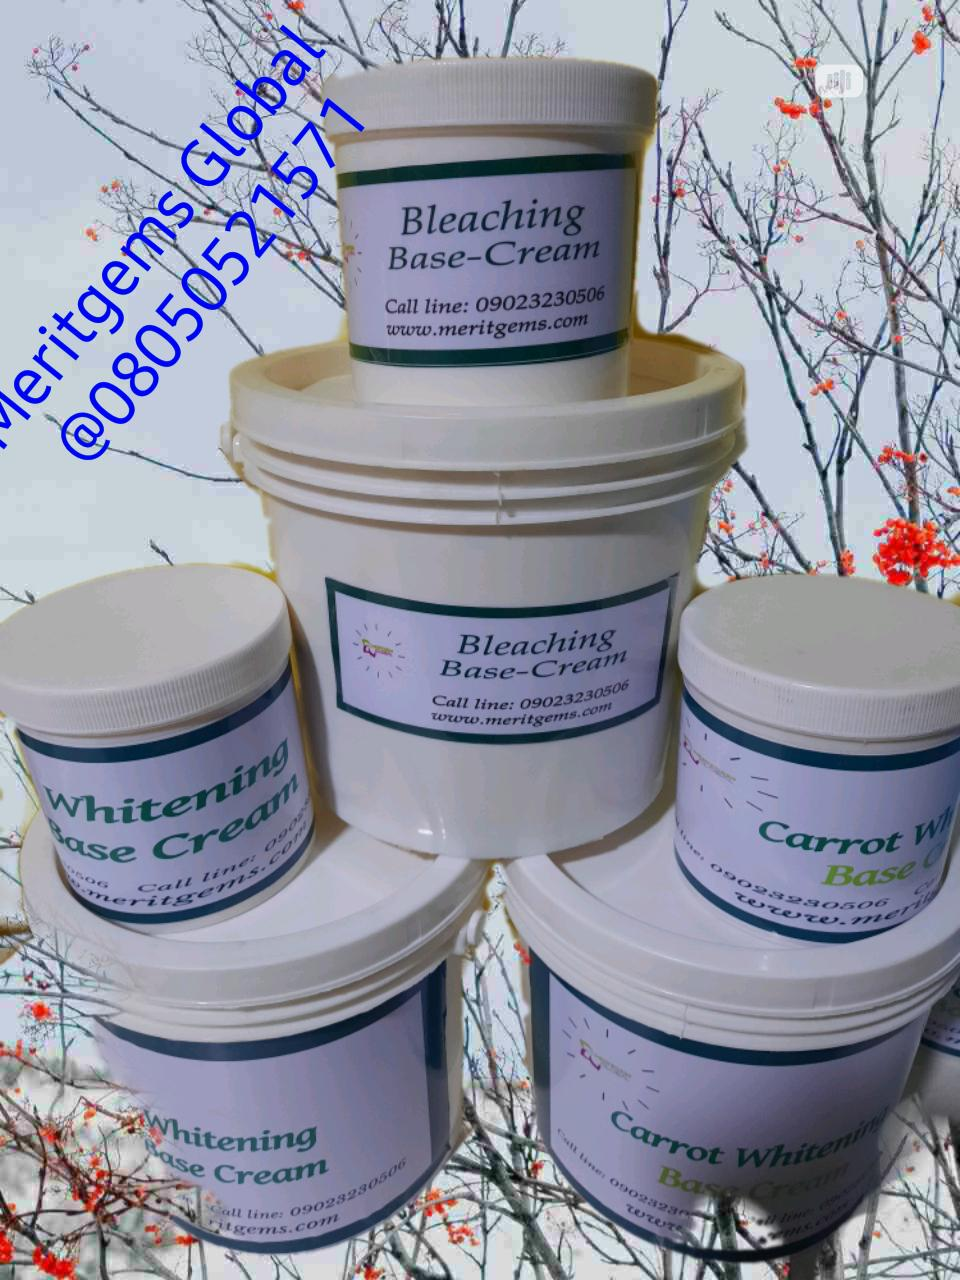 Whitening Base Cream